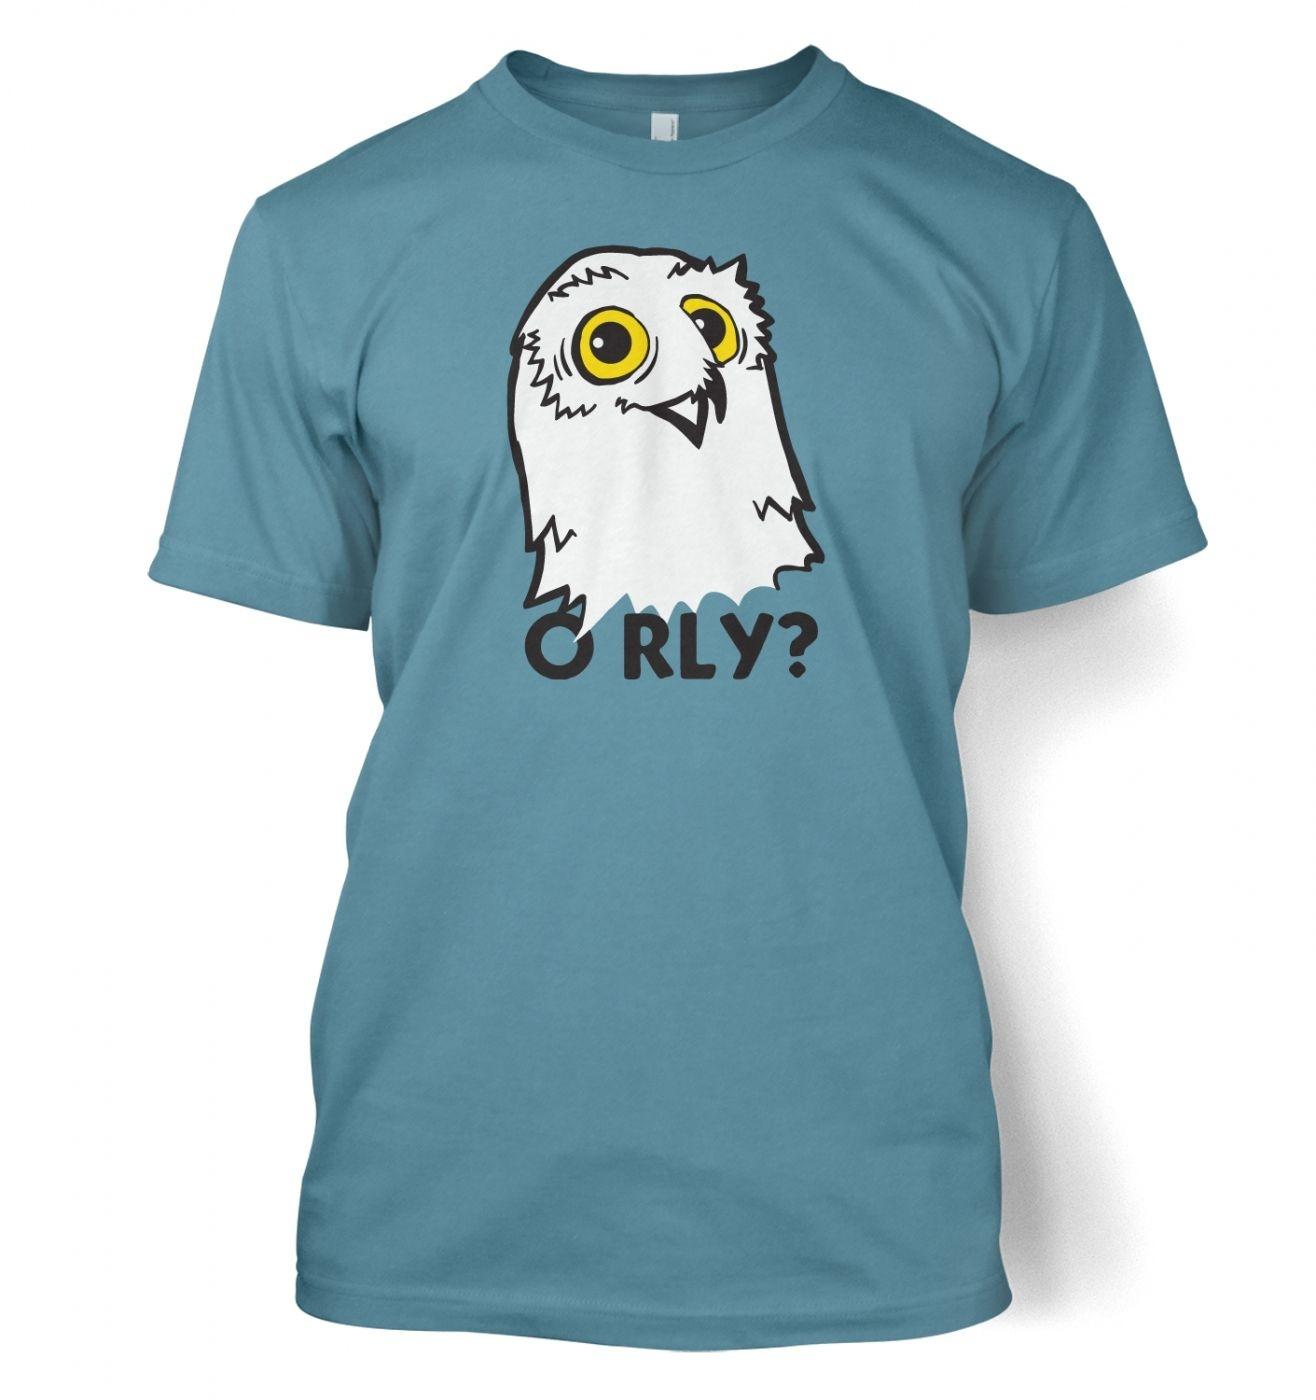 O RLY? Owl t-shirt